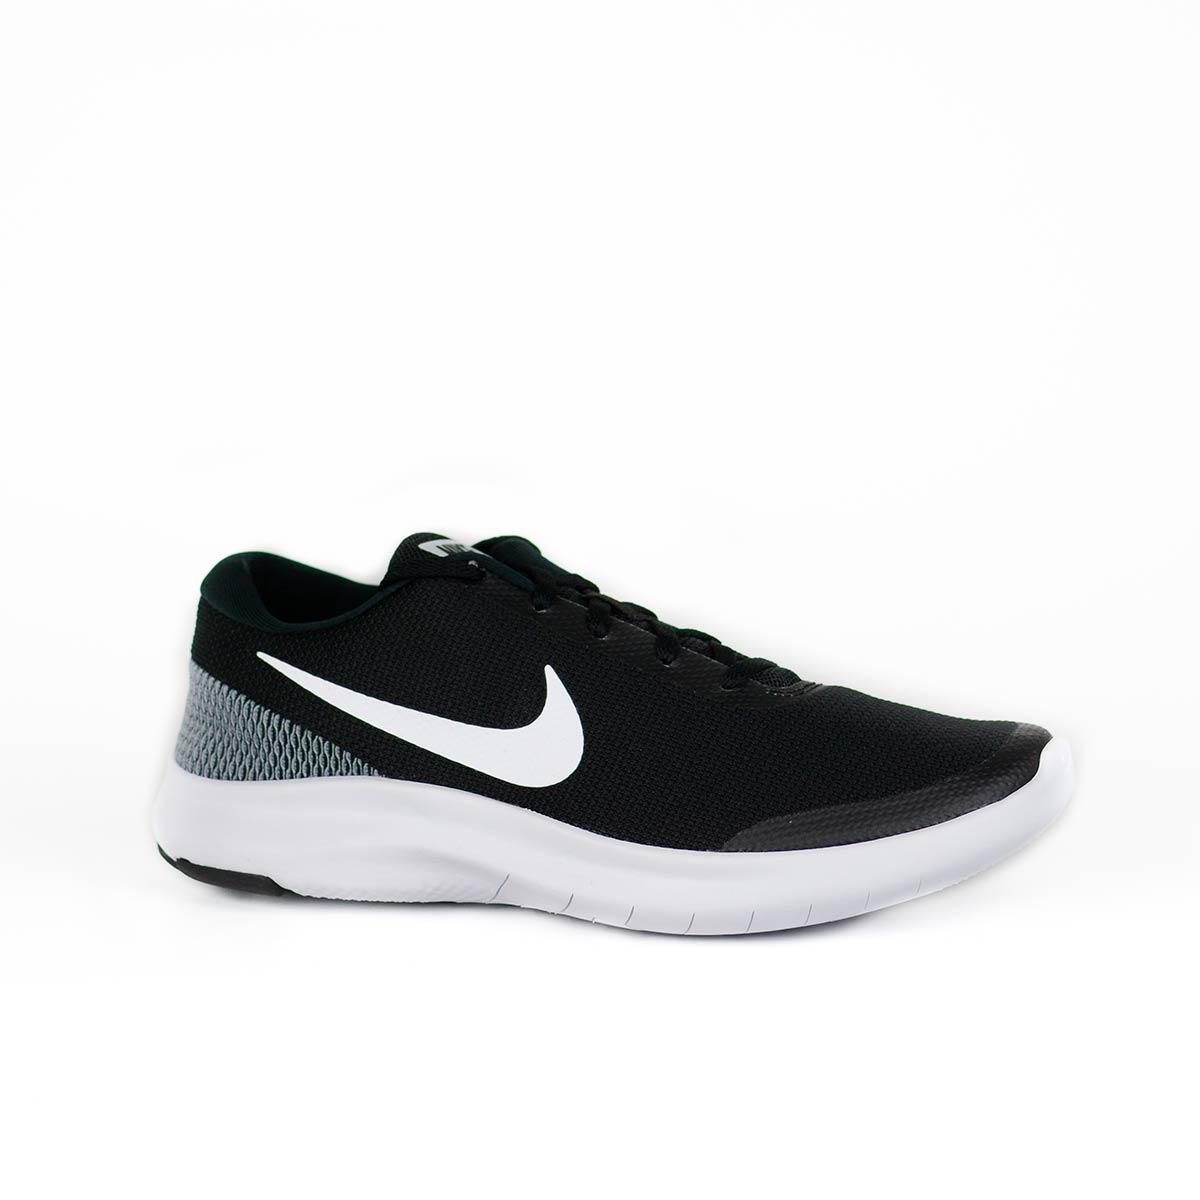 ba44f6f9f86 Nike Flex Experience RN 7 Preto Branco